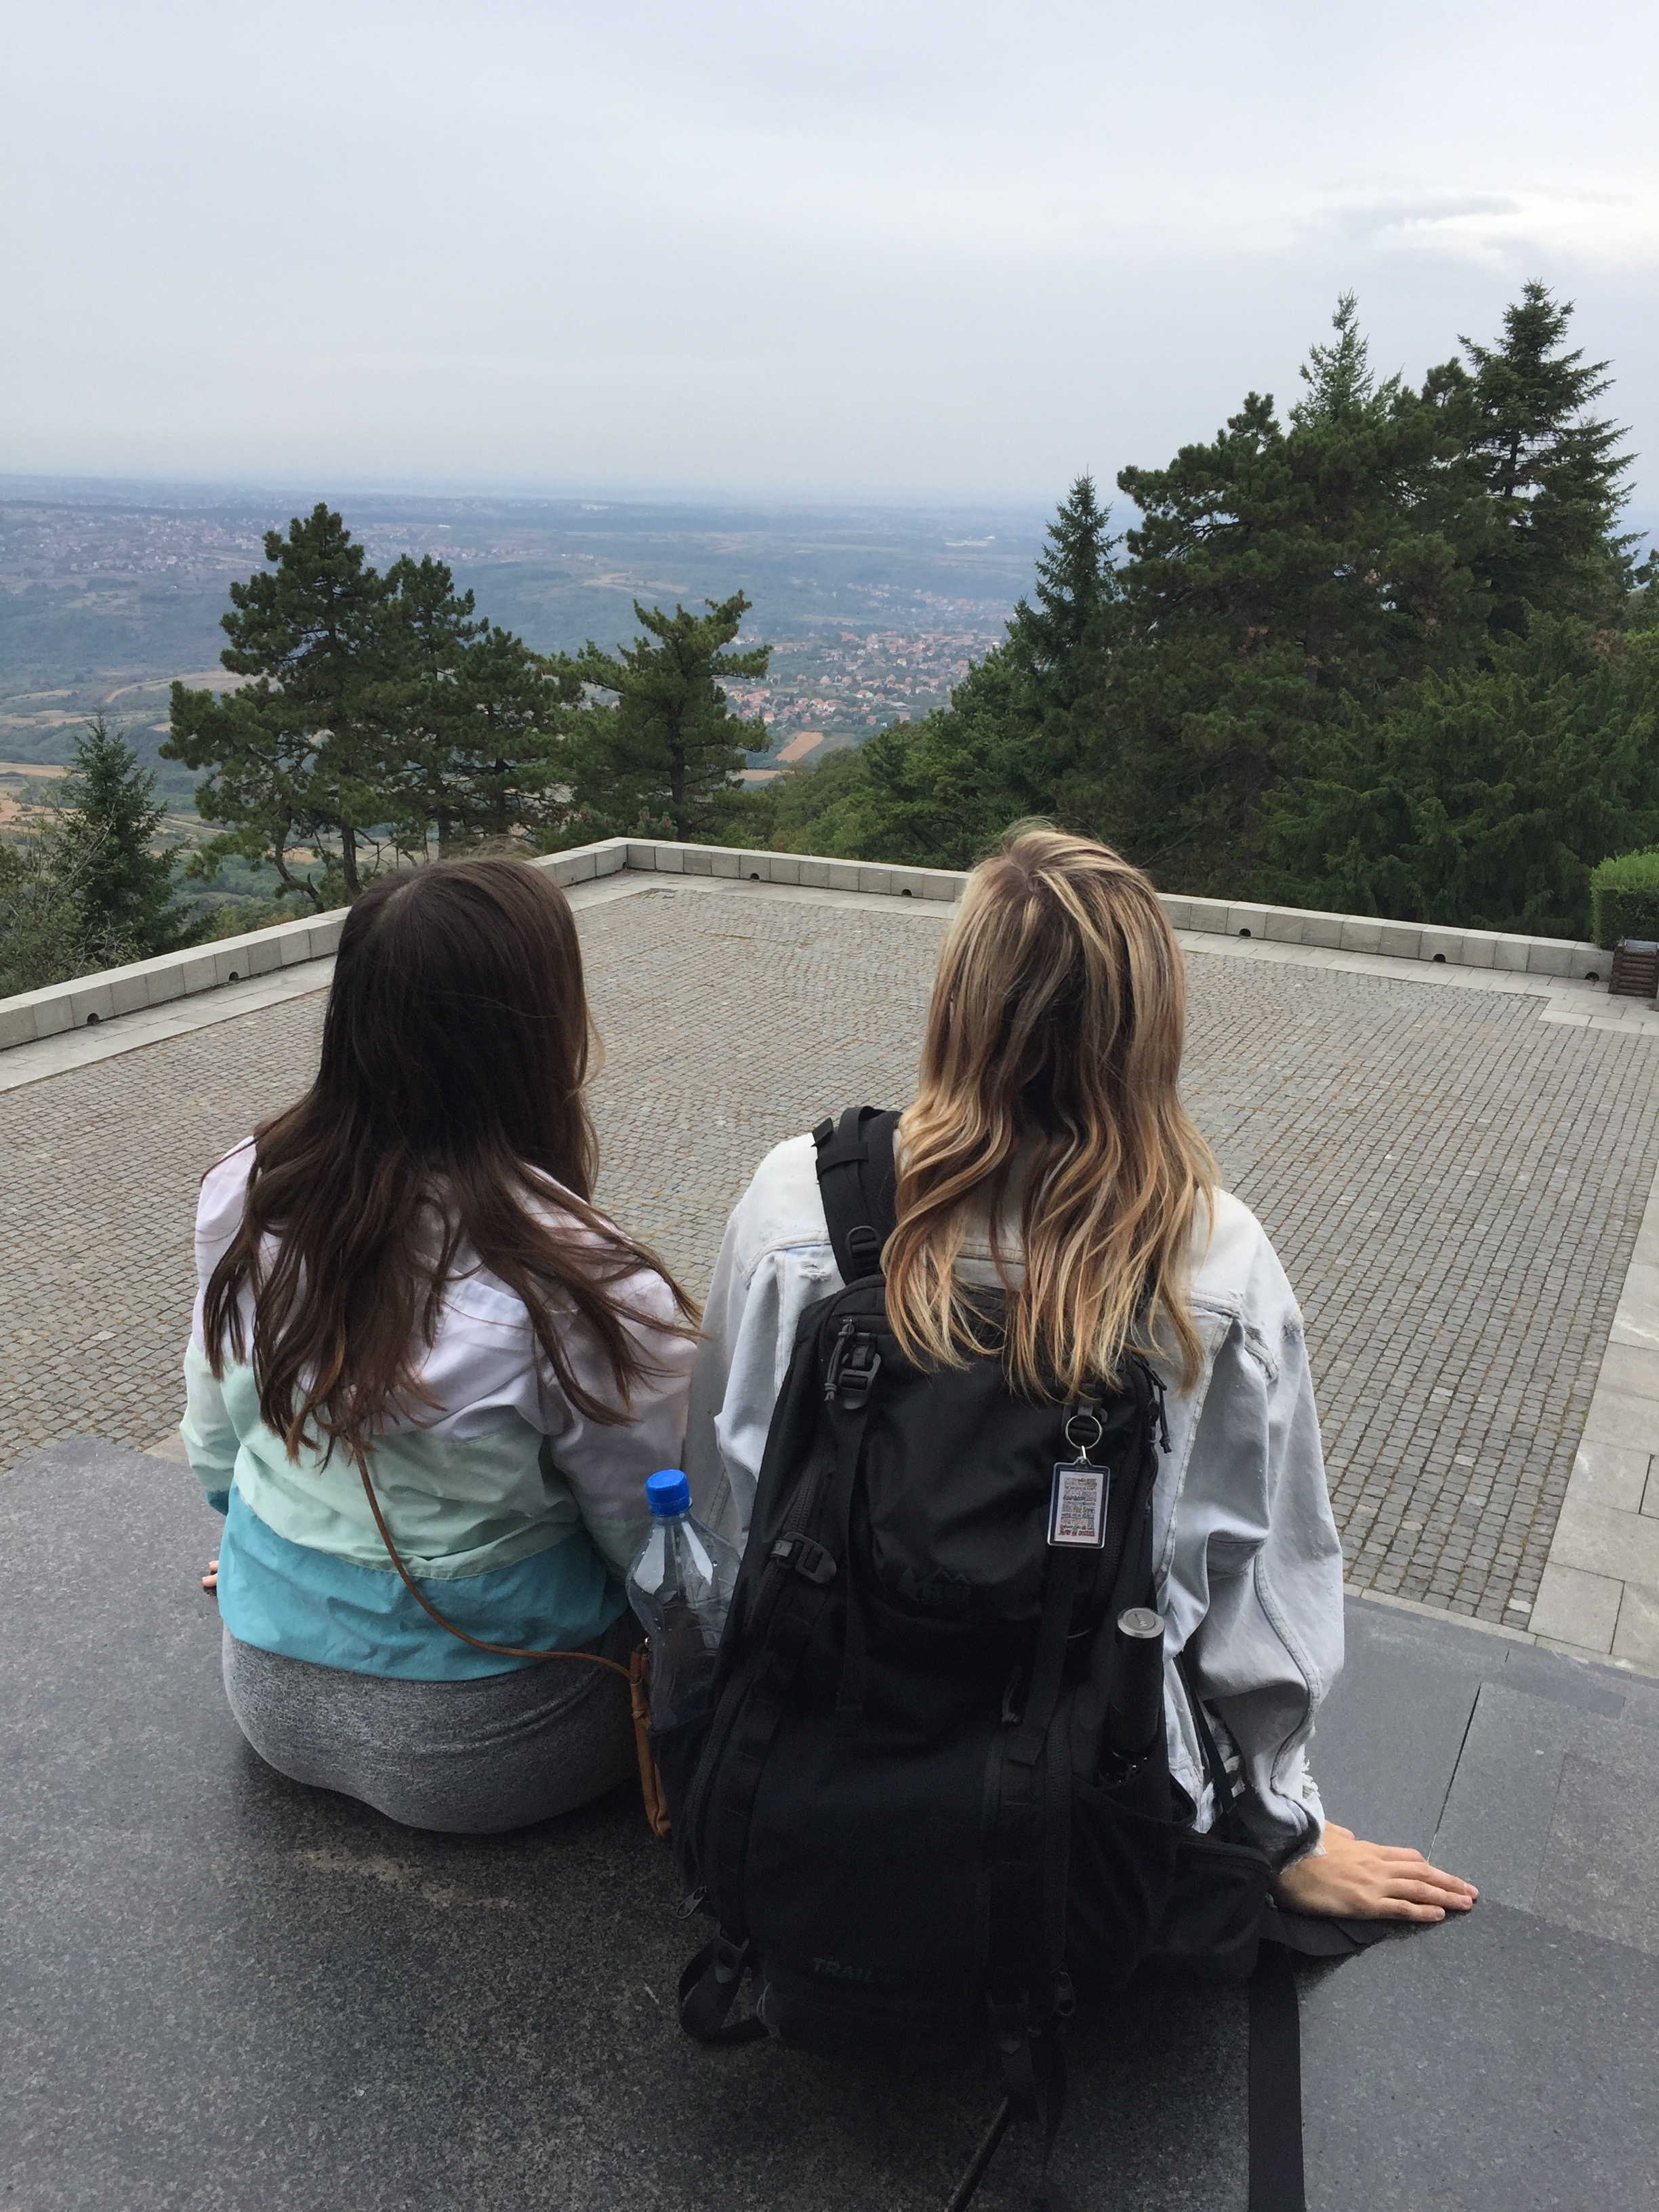 Views from Avila Tower park